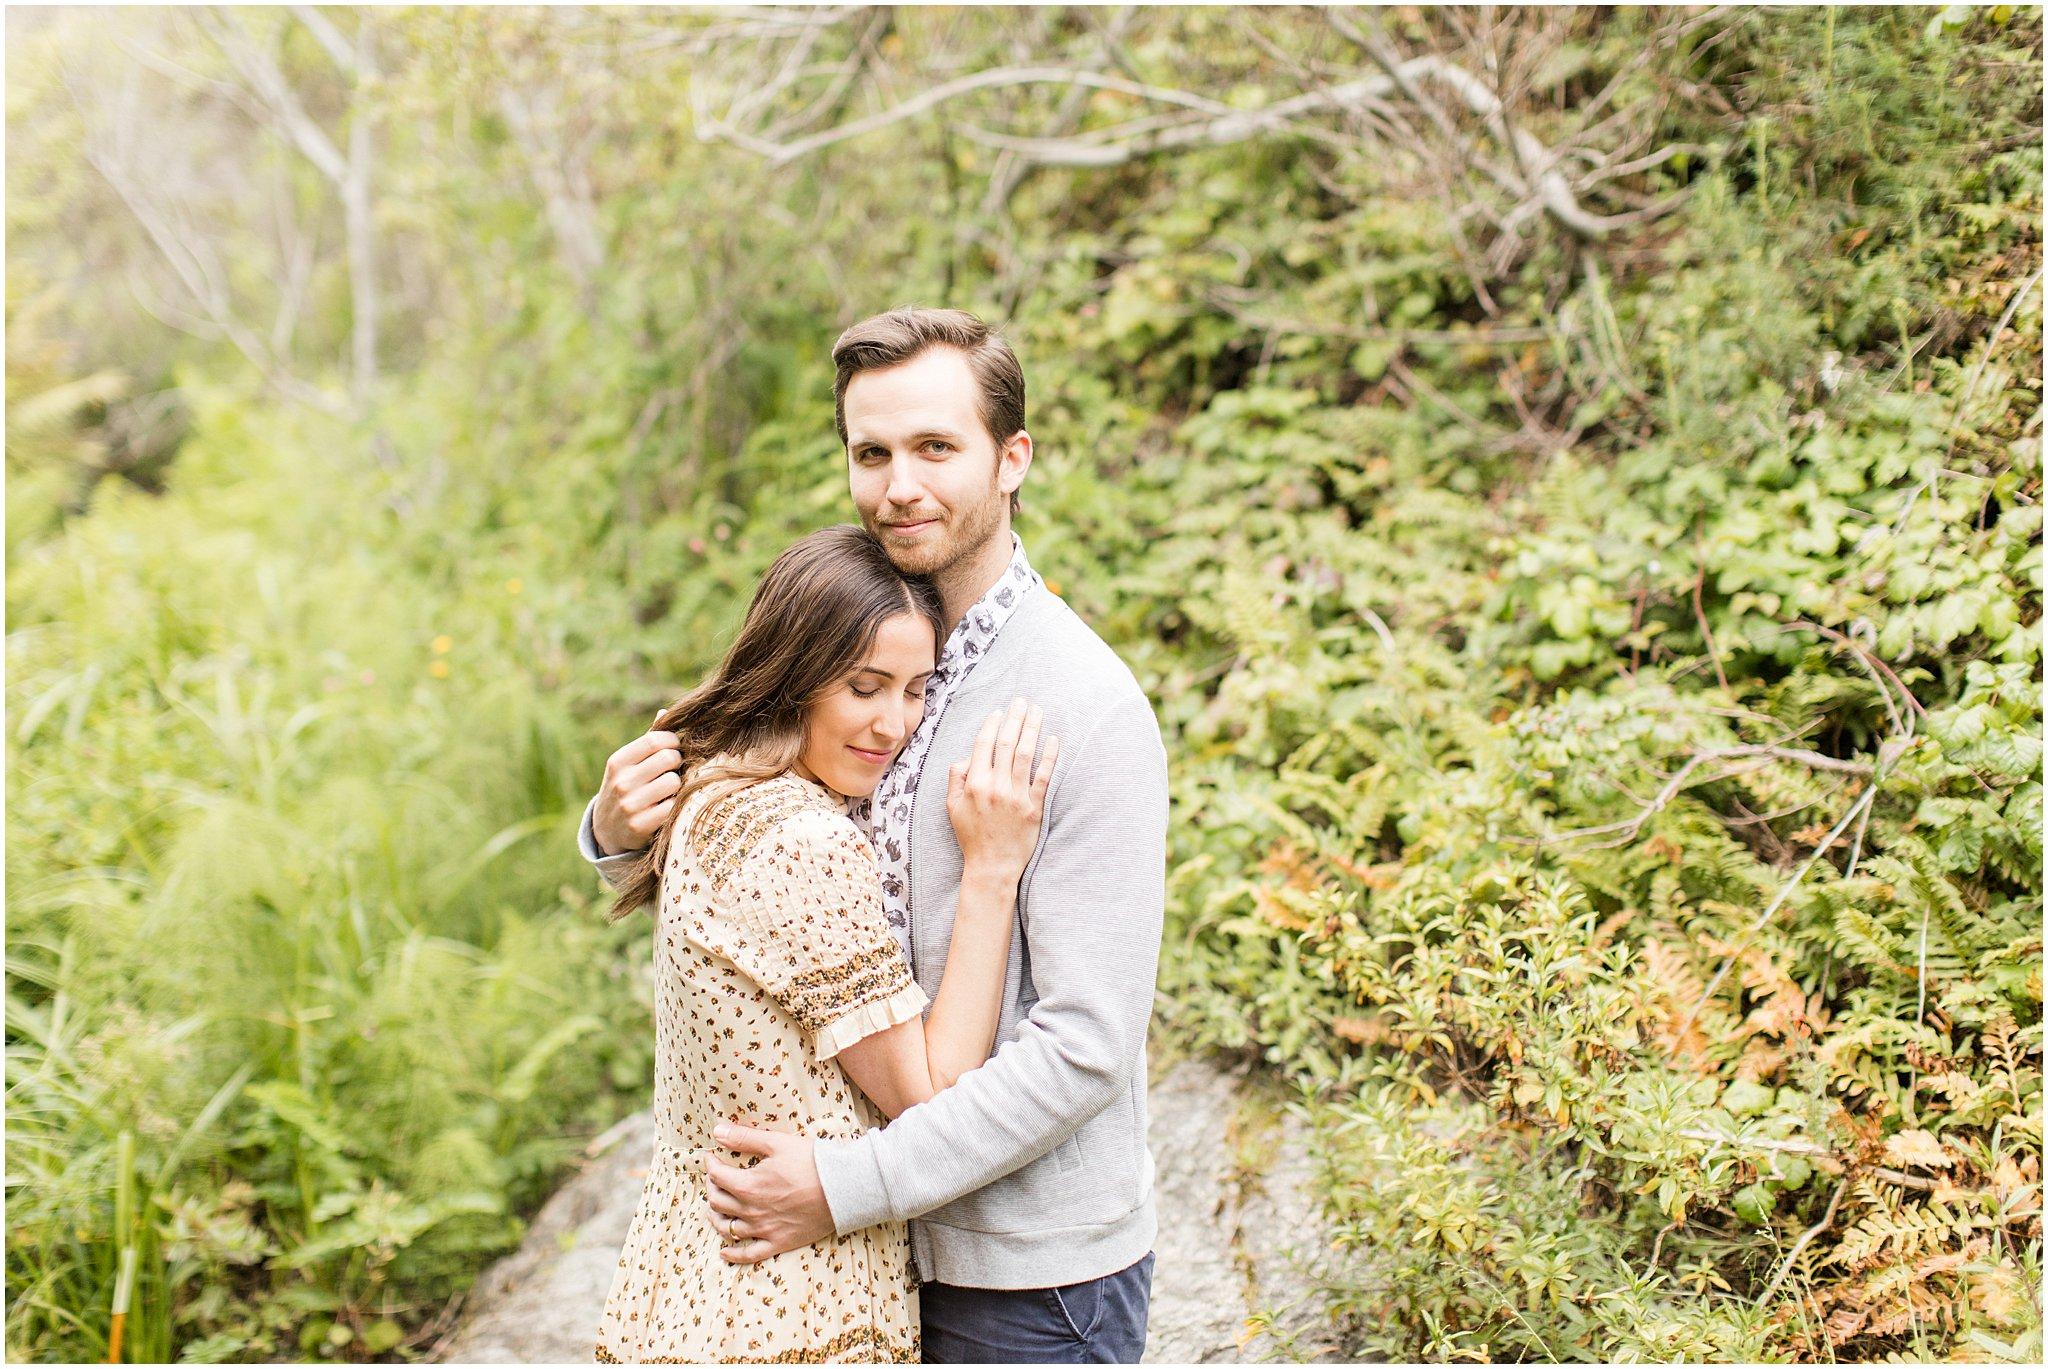 2019 carmel highlands garrapata state park couples portrait session bay area wedding photographer_0005.jpg